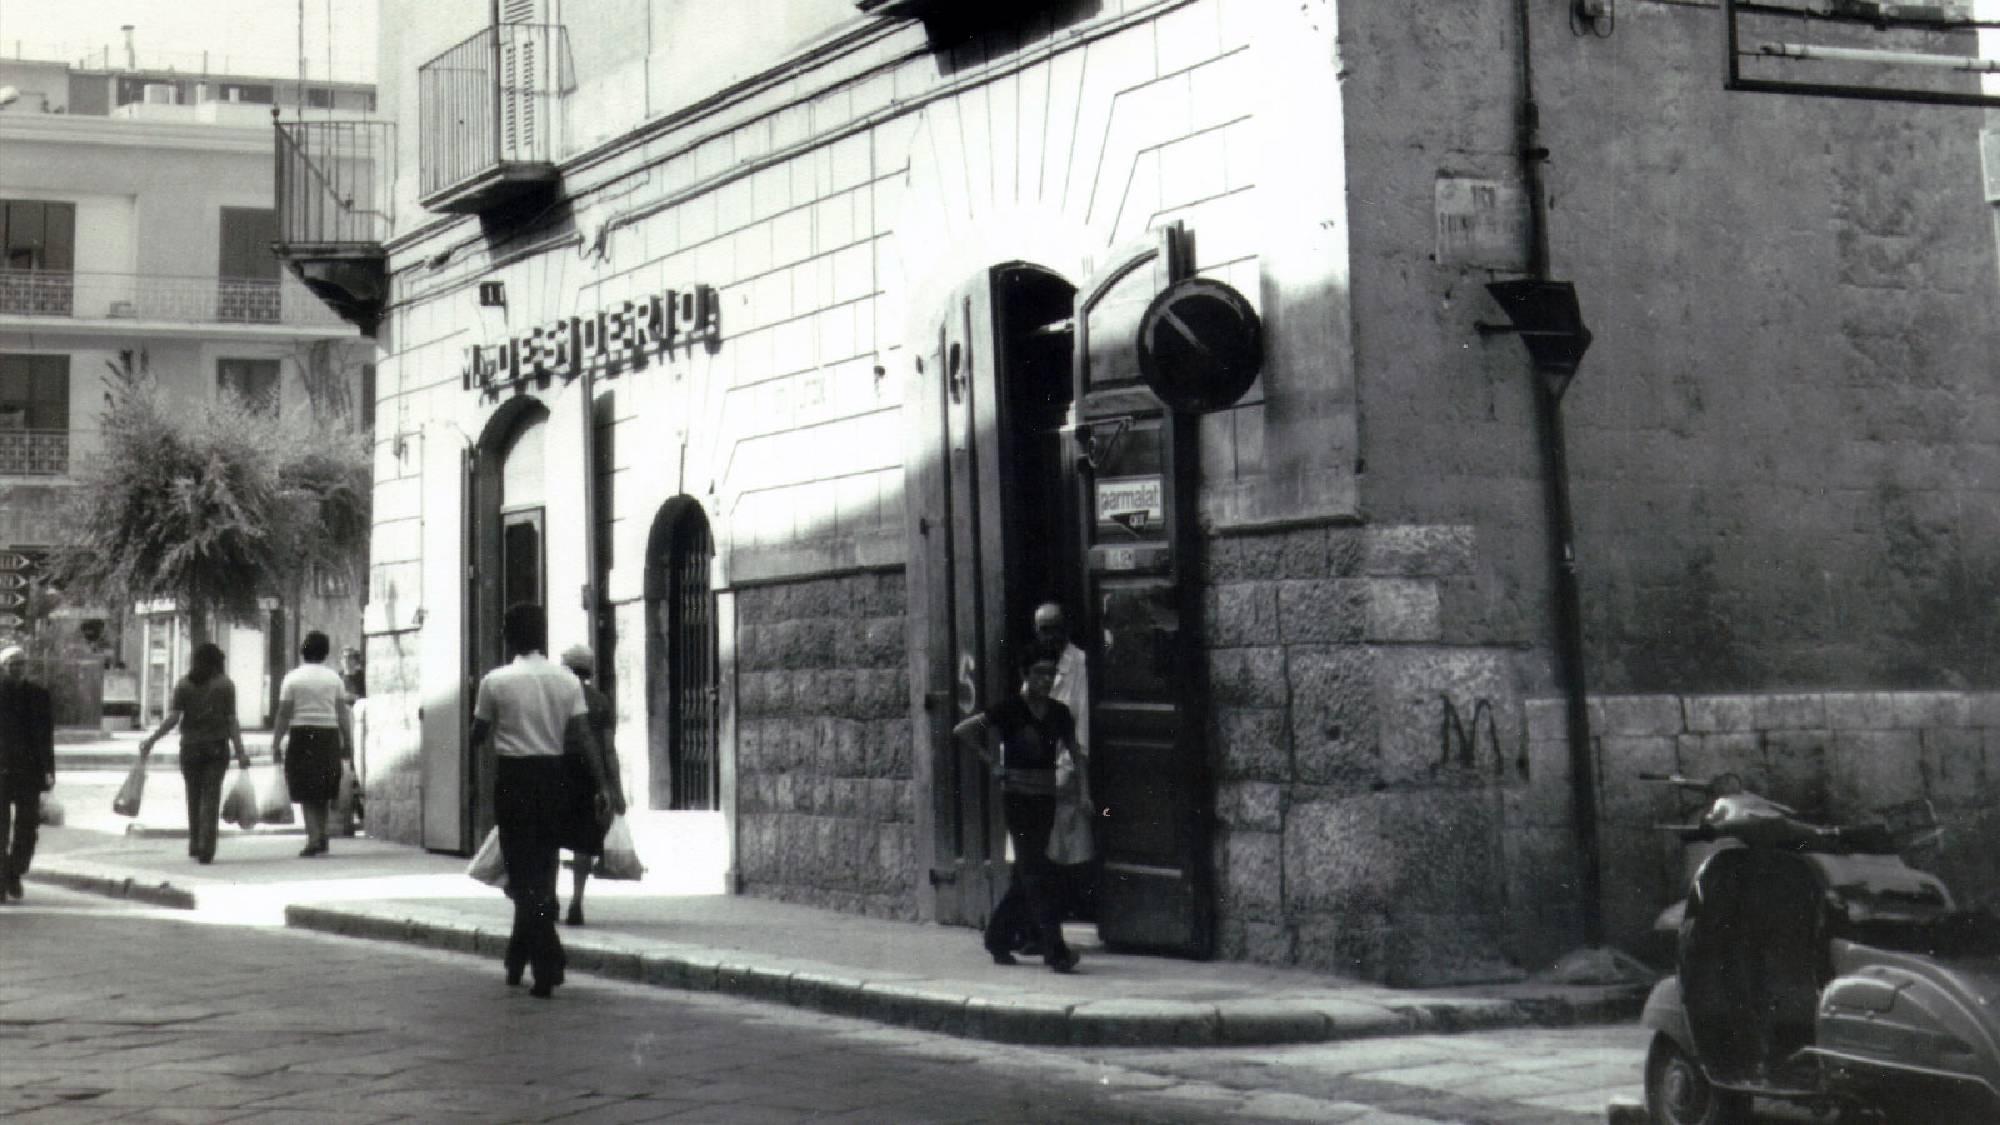 Desiderio 1966